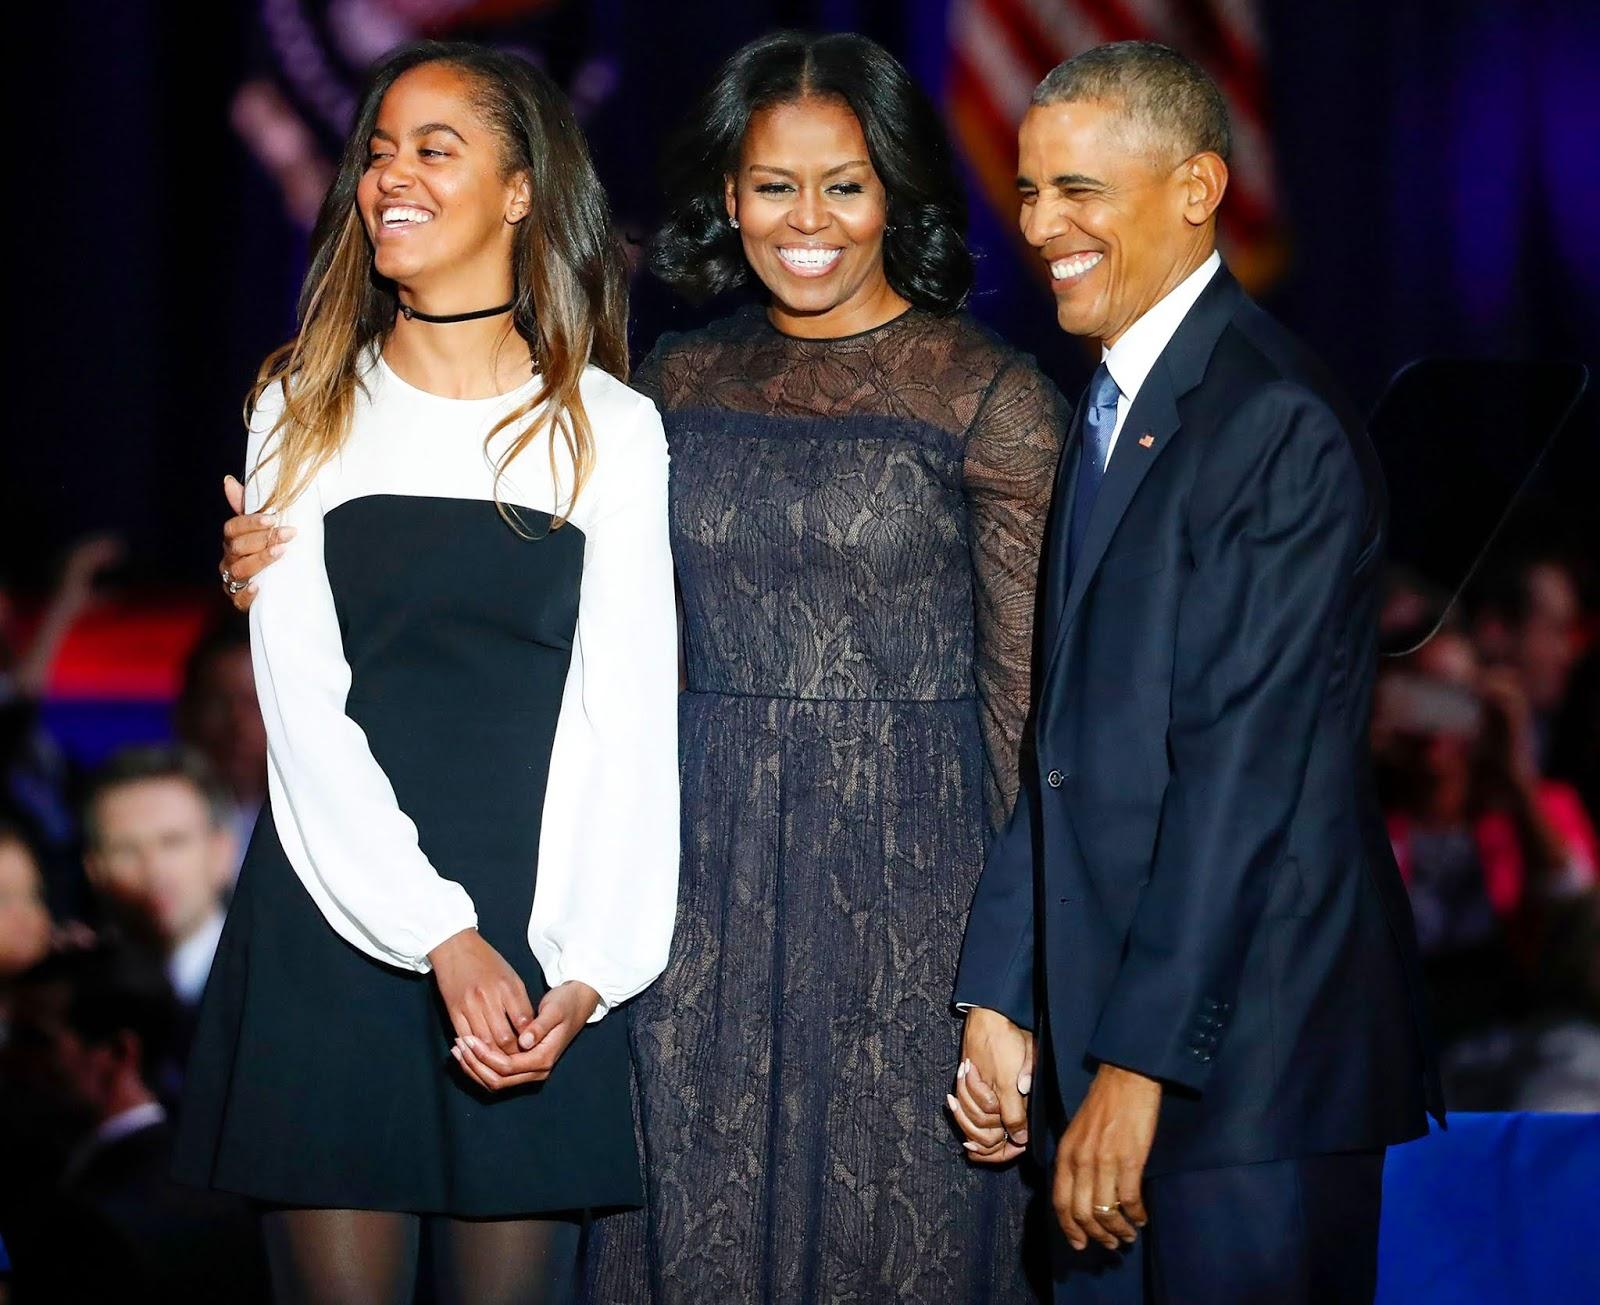 malia obama with barak Obama;s wife